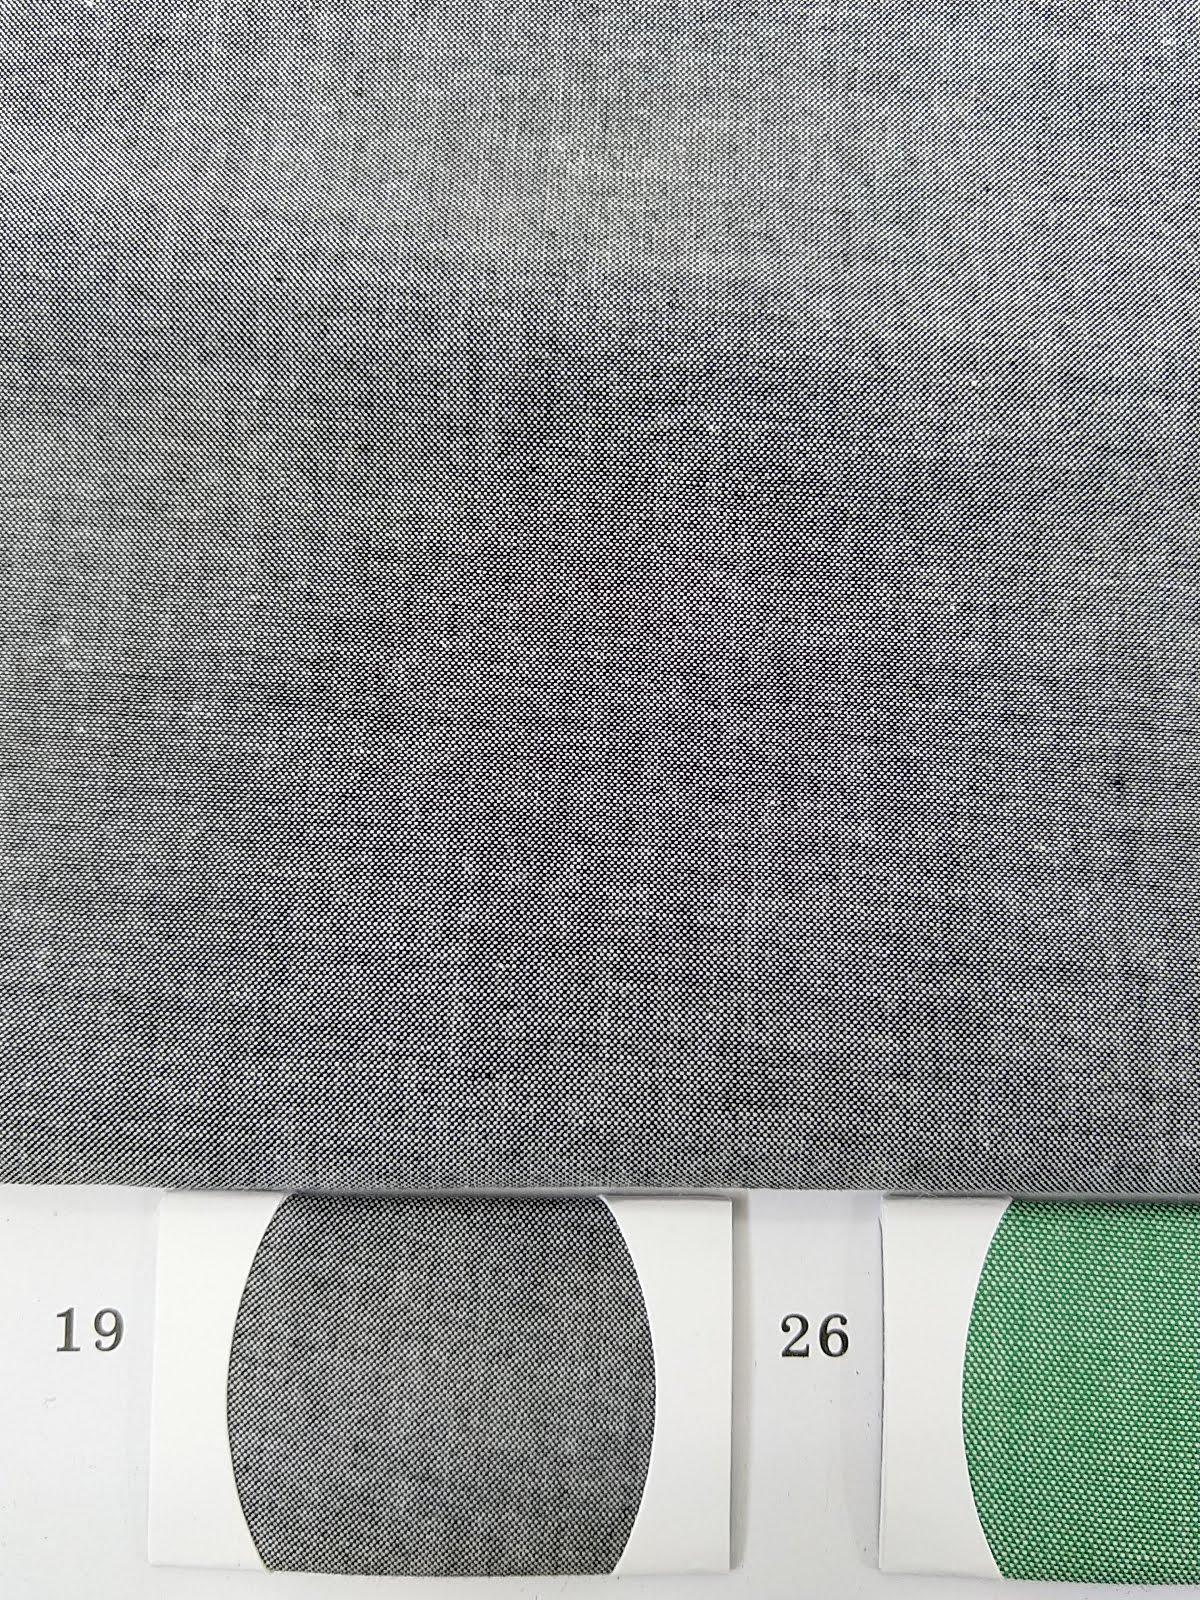 Black Chambray Fabric for men shirt